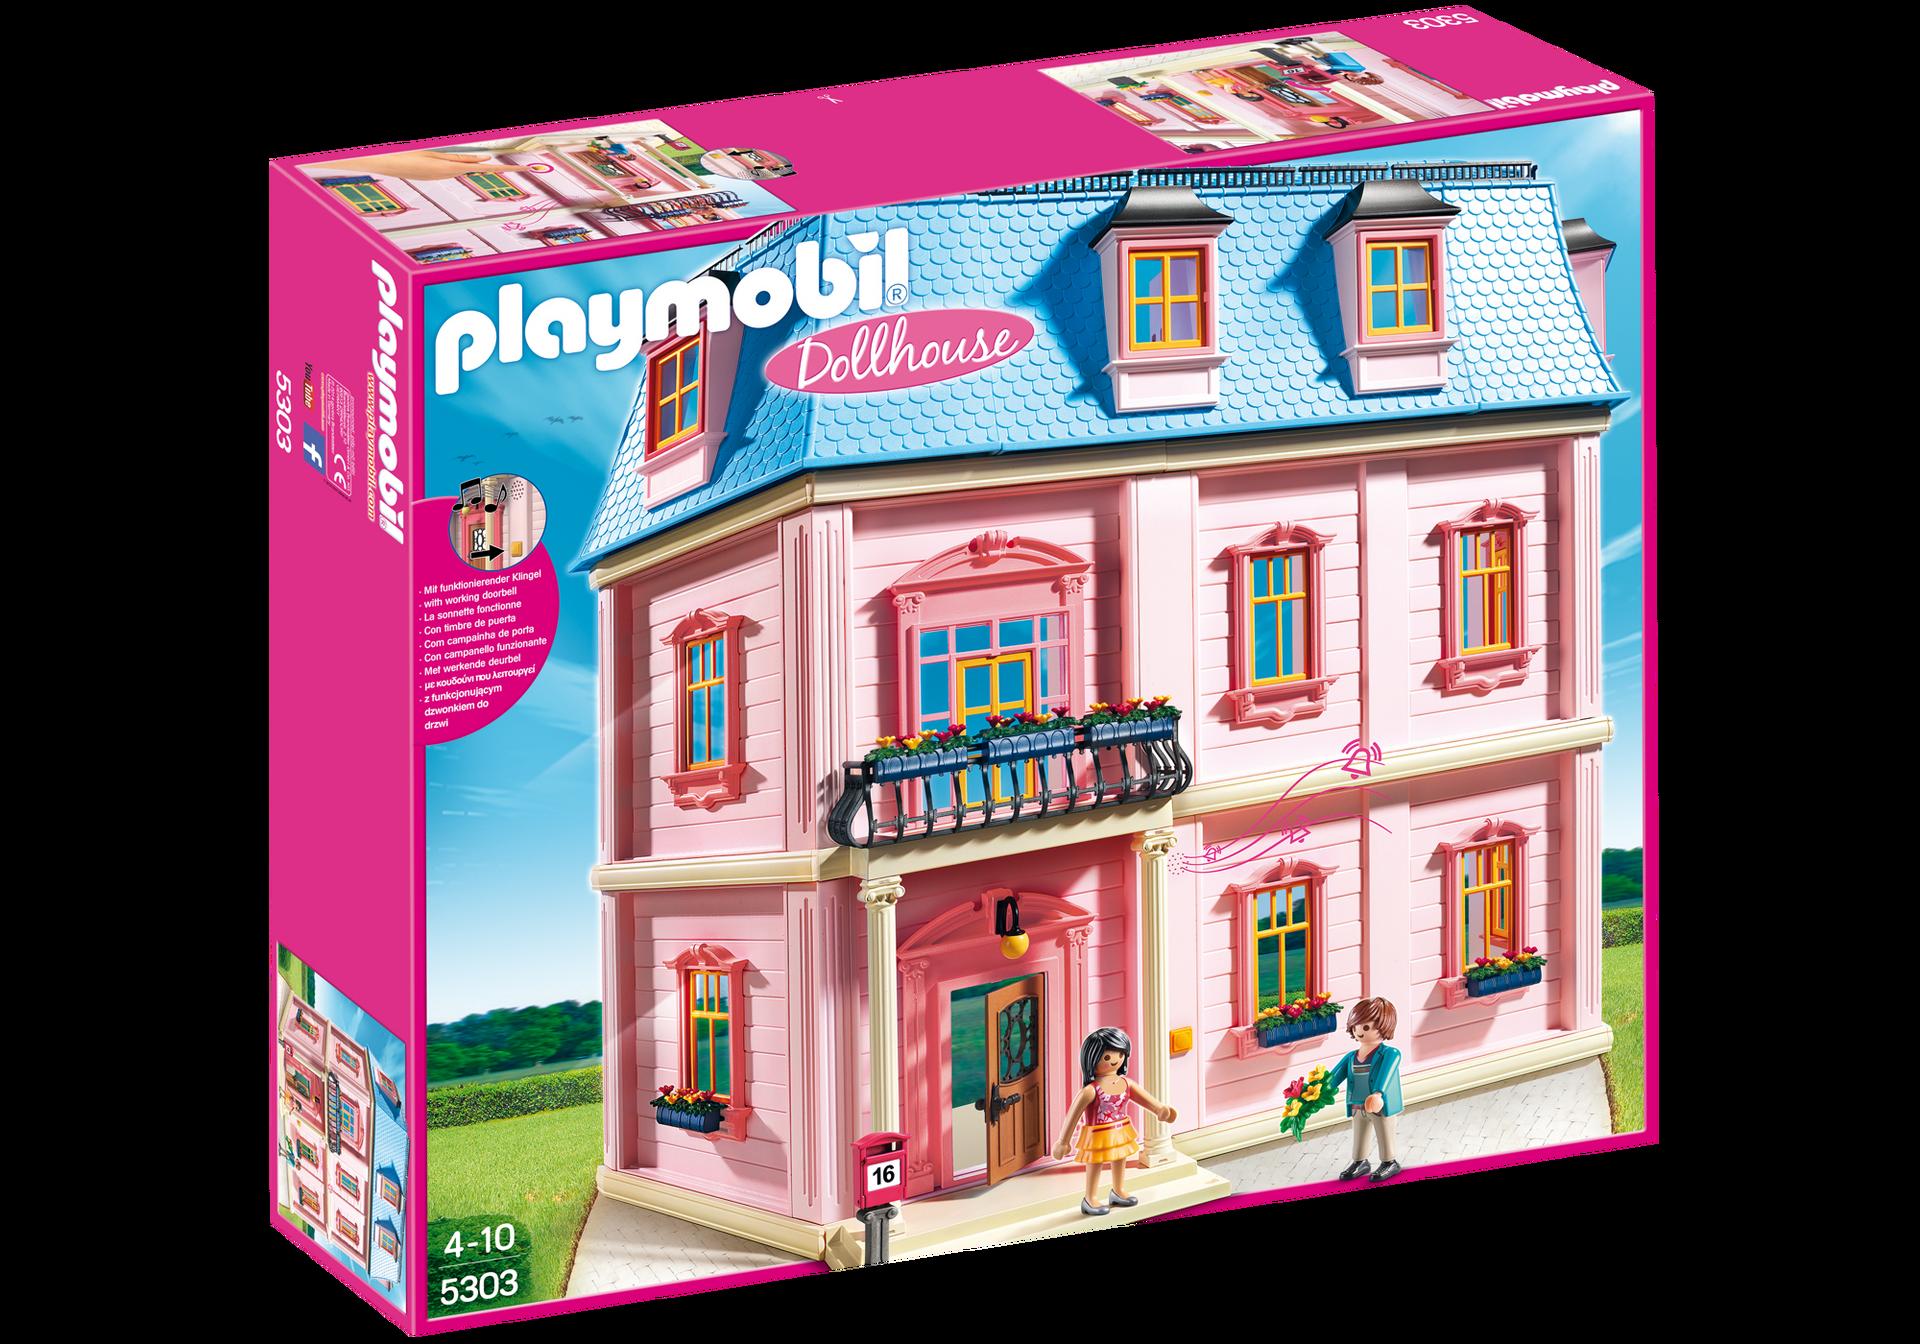 Http Media Playmobil Com I Playmobil 5303 Product Box Front Doll House Playmobil Playmobil Sets